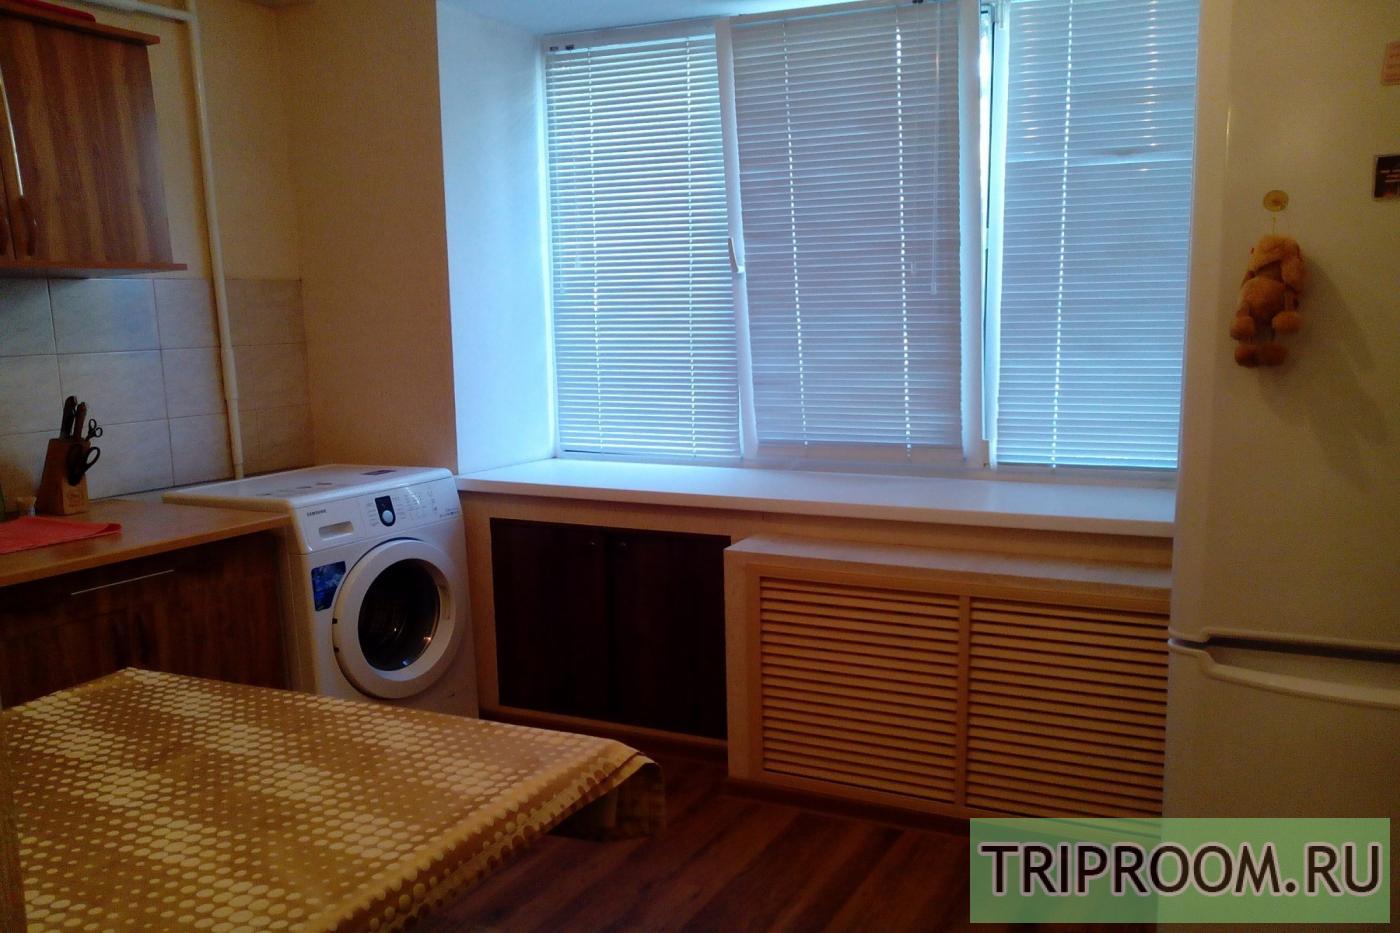 1-комнатная квартира посуточно (вариант № 23177), ул. Маршала Еременко, фото № 3